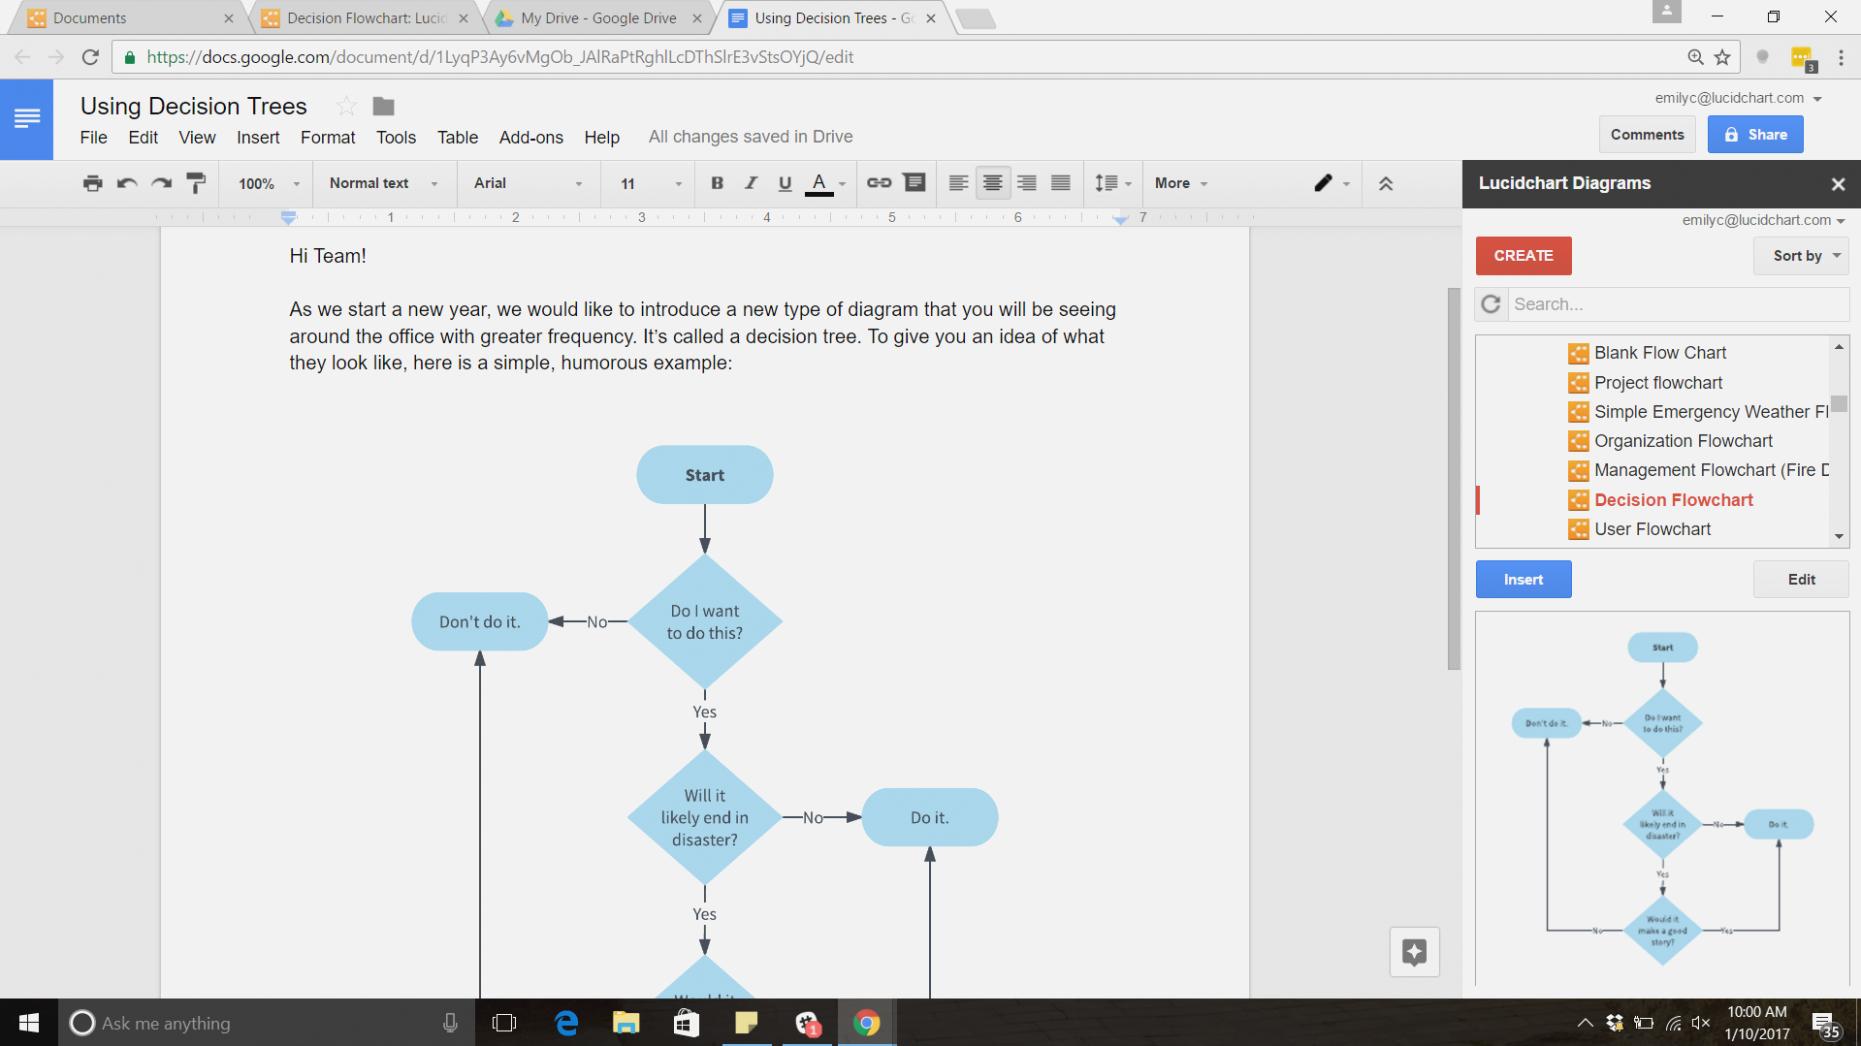 Tree Diagram Maker How To Make A Tree Diagram In Google Docs Lucidchart Blog